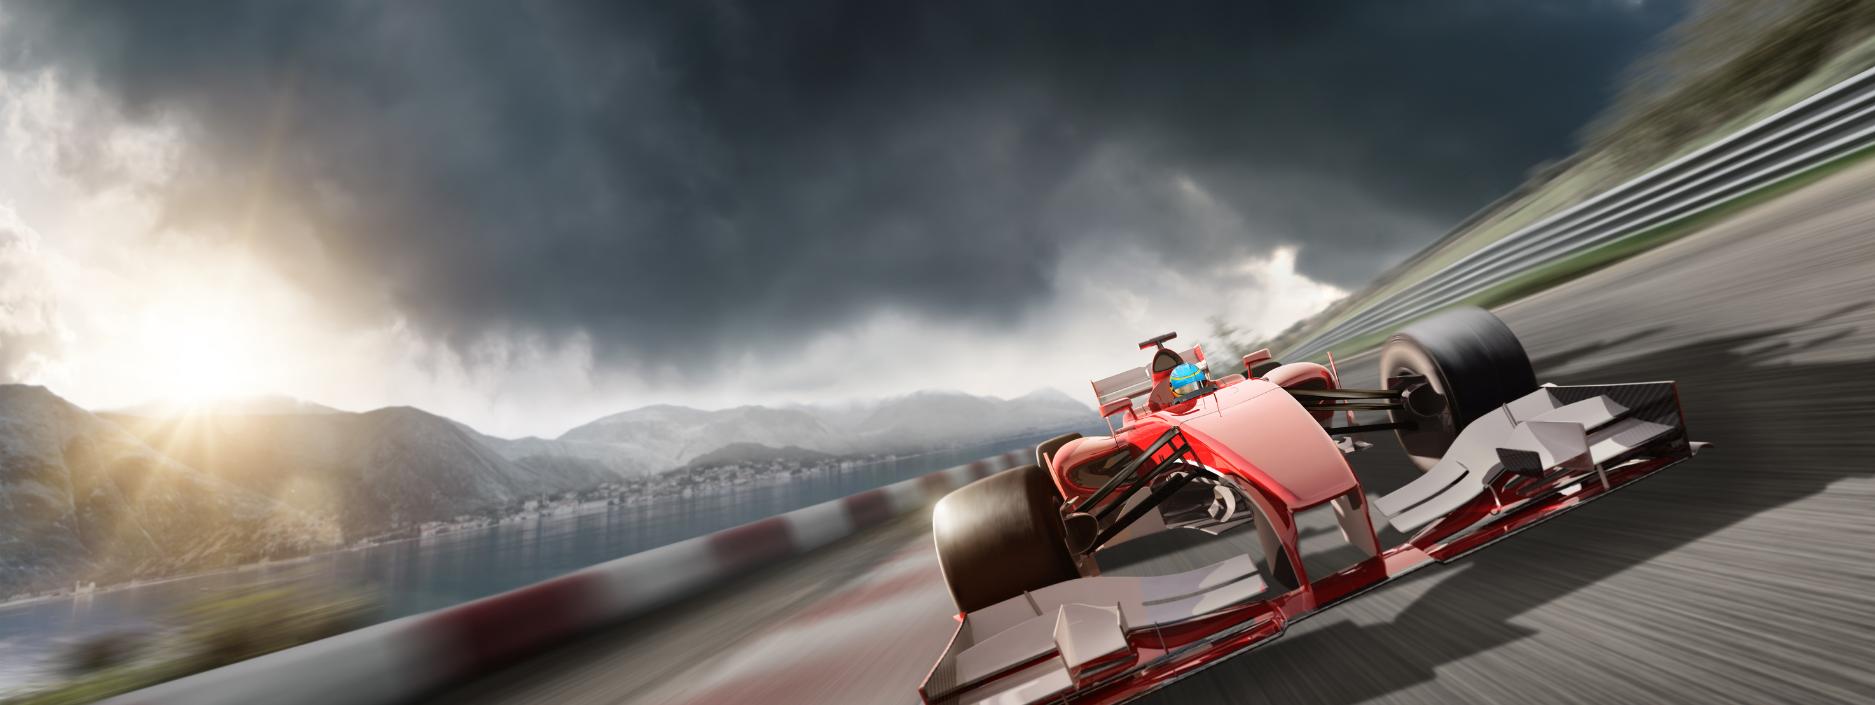 F1 race track